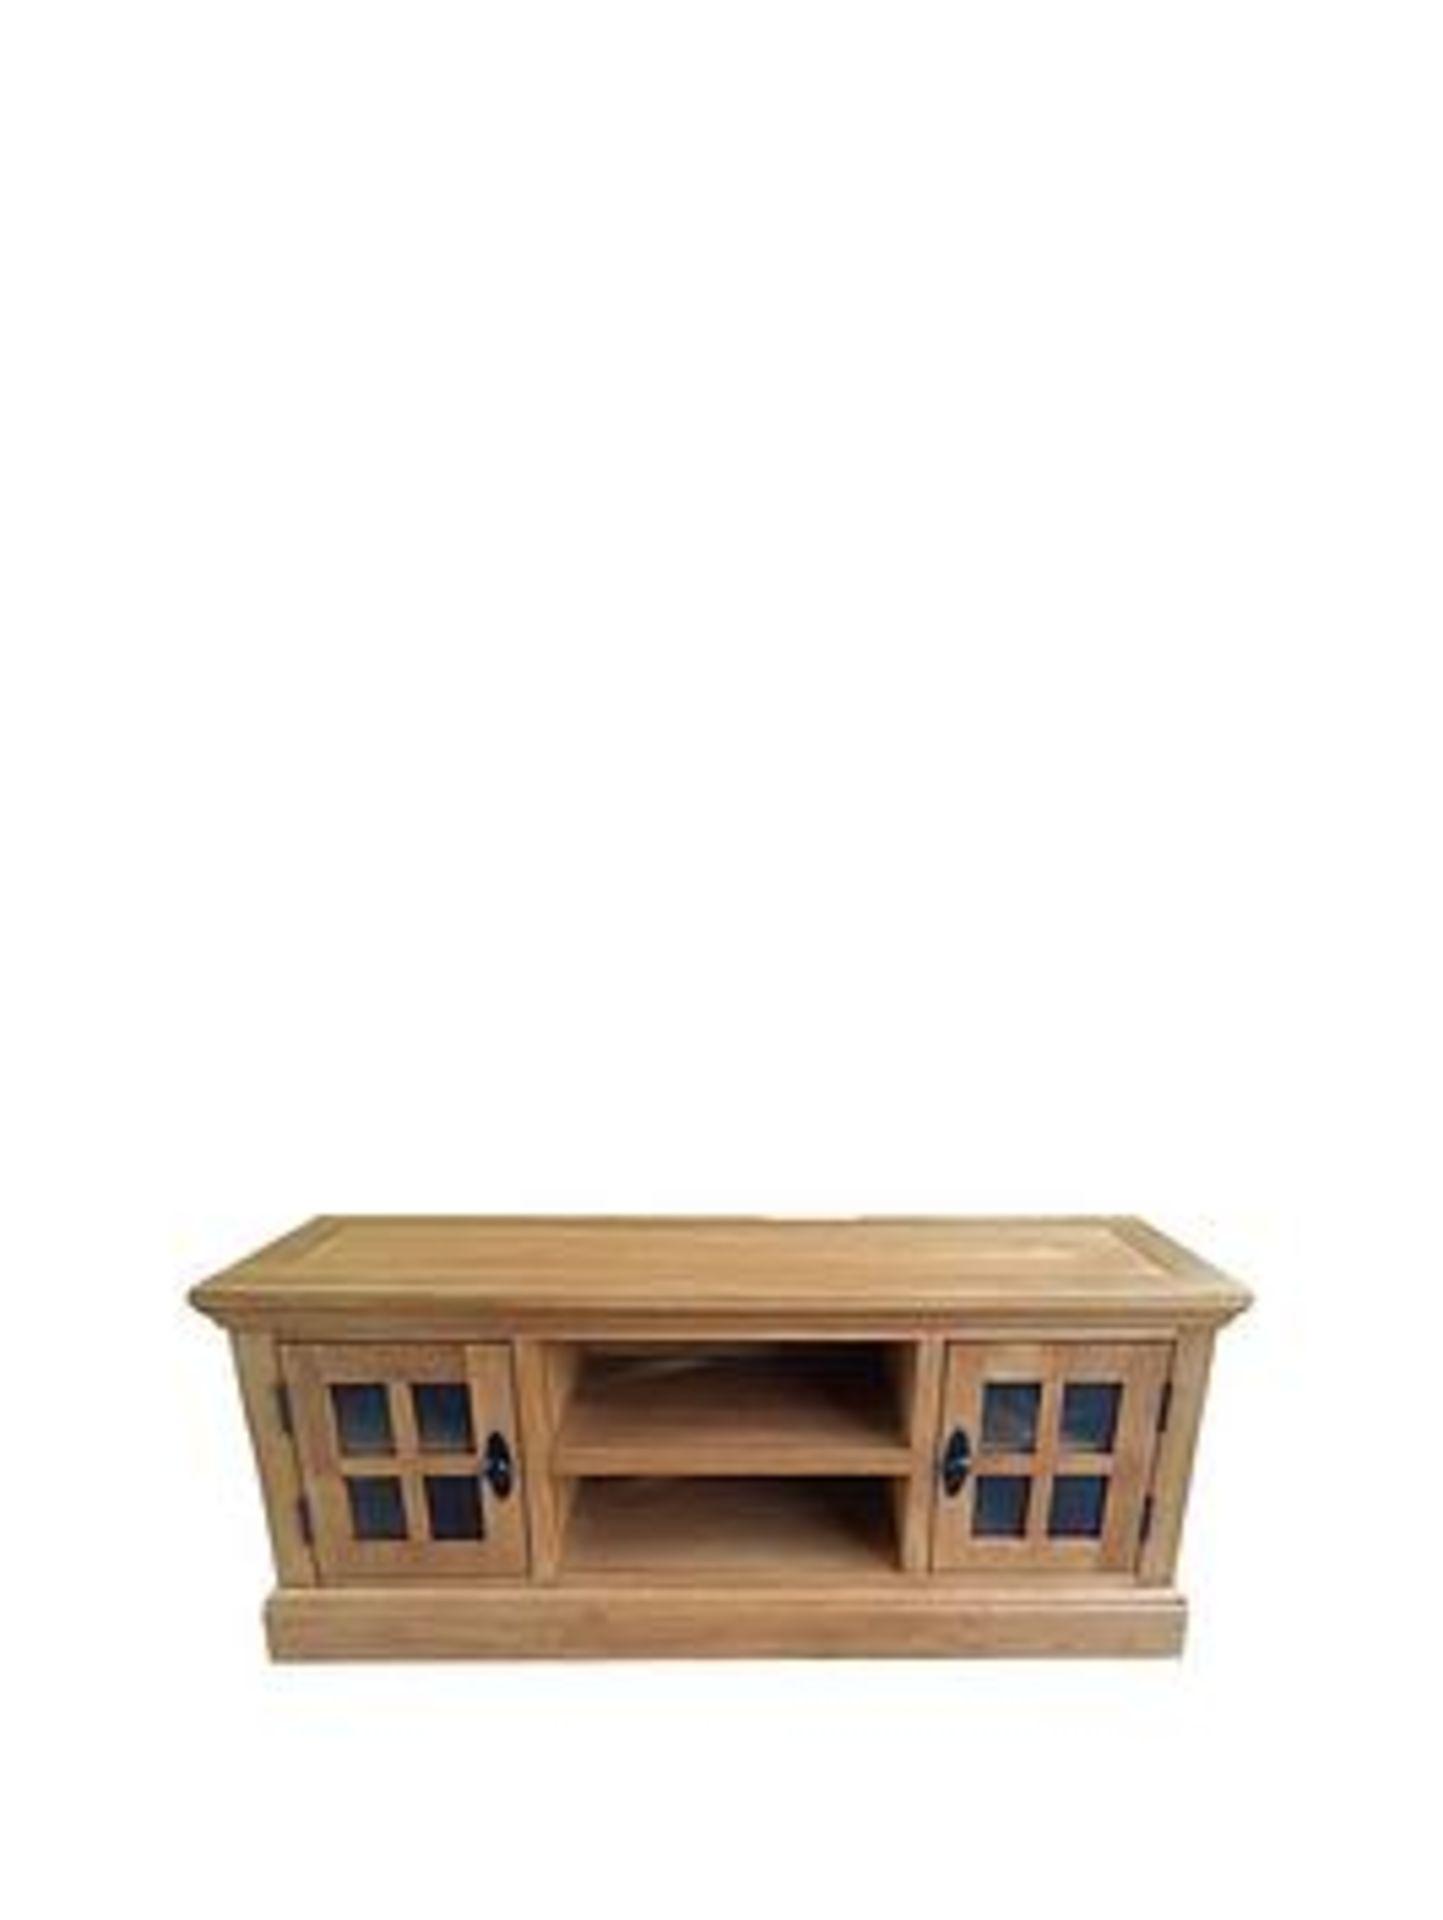 Lot 43 - Boxed Item Ideal Home Whitford Real Oak 2Pc Living Room Set [Oak] Rrp:£828